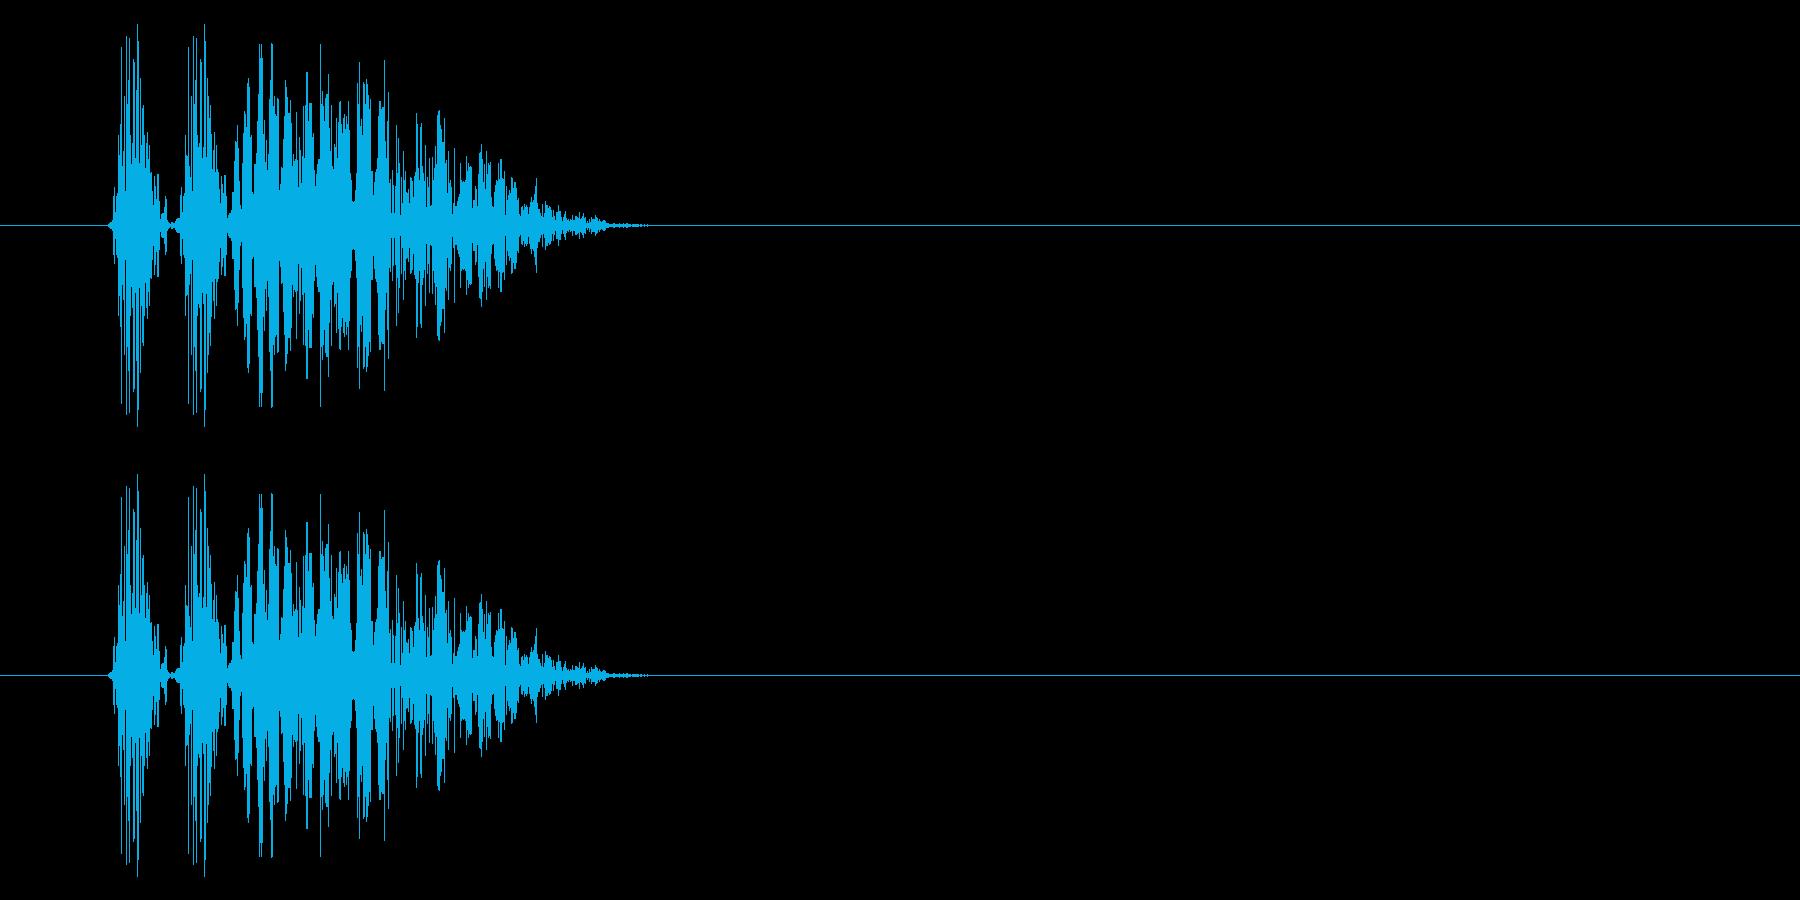 SNES 格闘02-07(爆発)の再生済みの波形